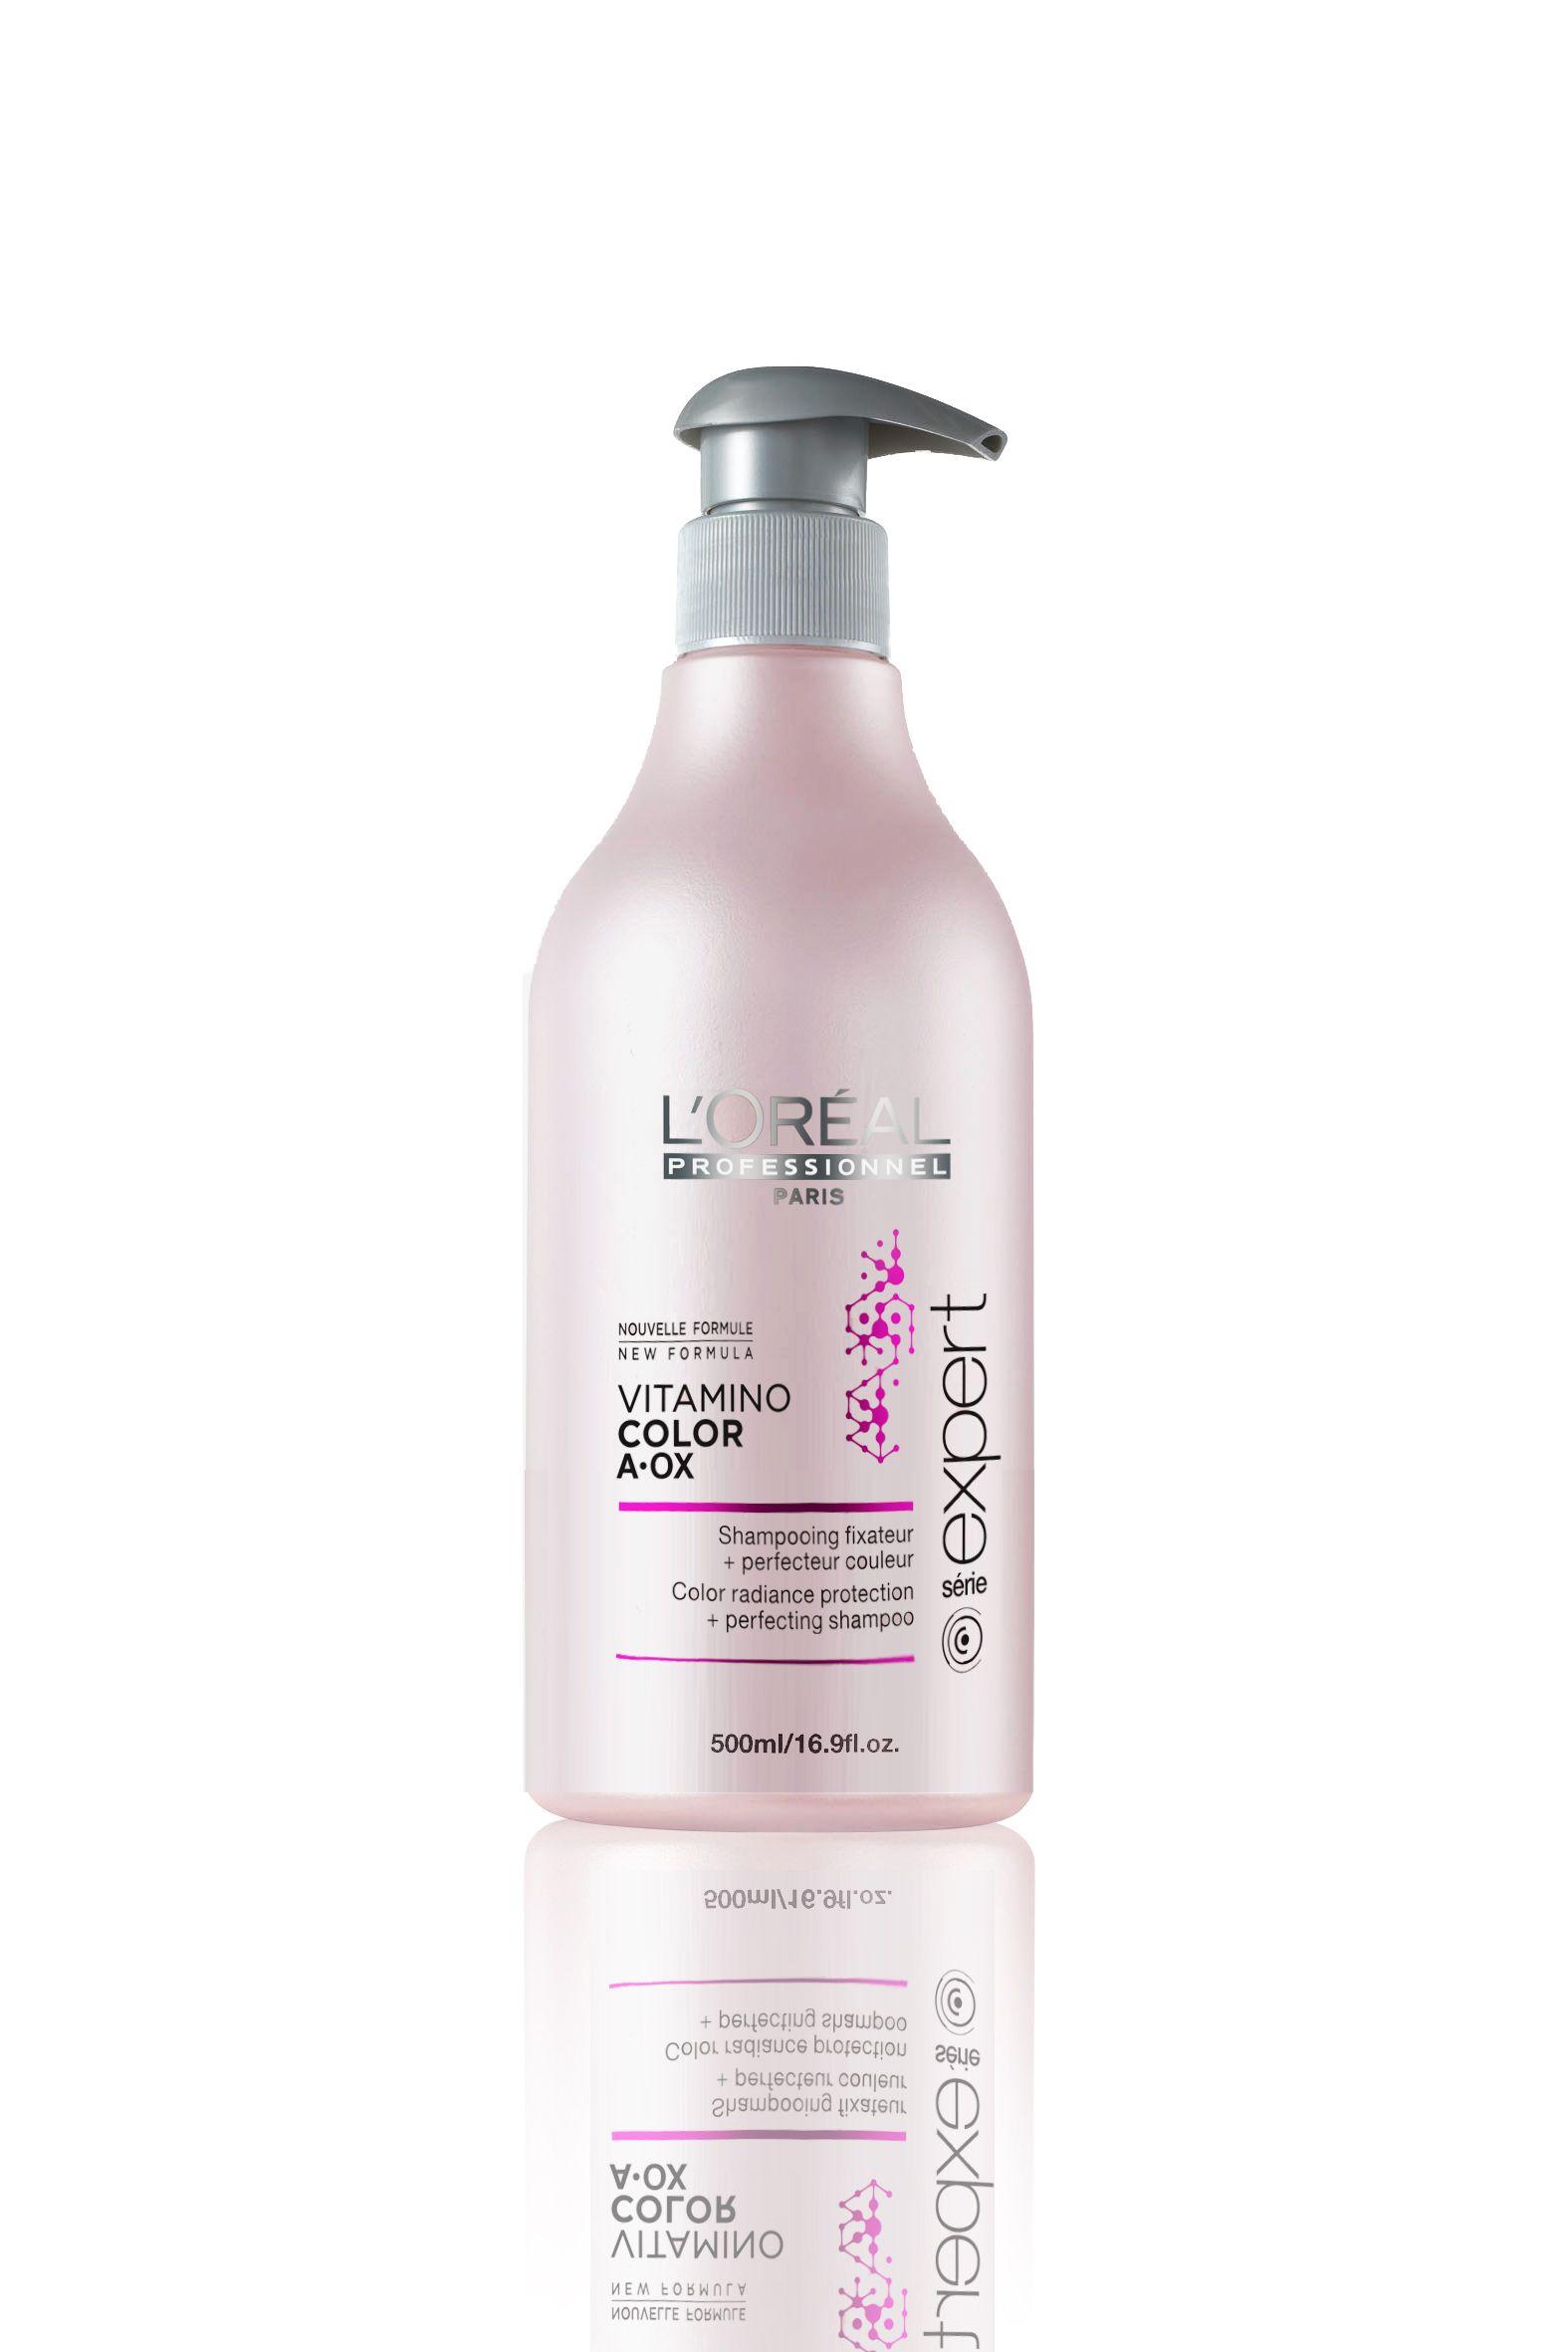 LOreal Paris Serie Expert Vitamino Color A-OX Shampoo